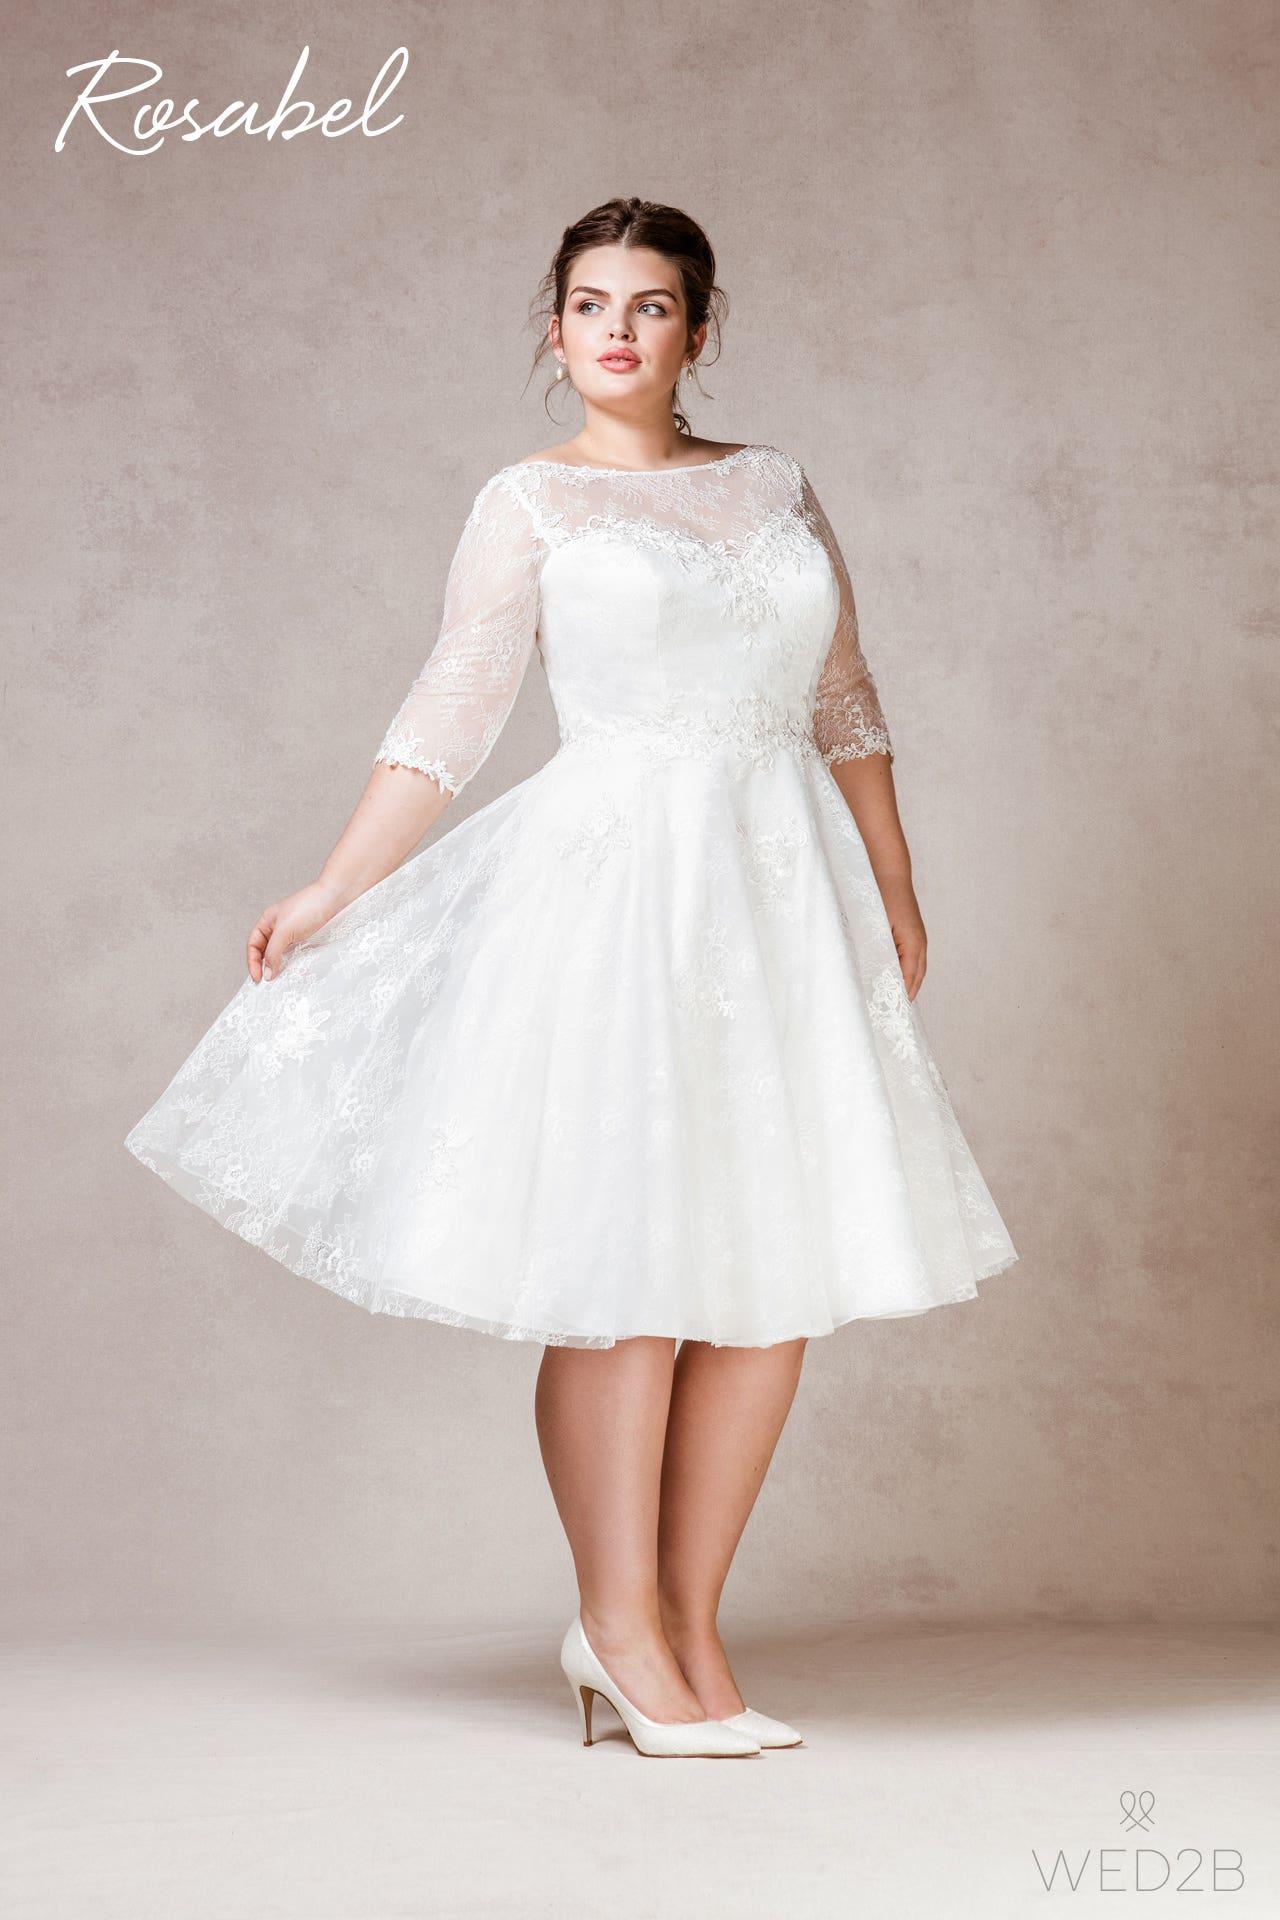 Introducing Bellami Our Beautiful Plus Size Wedding Dress Collection Wed2b Uk Blog